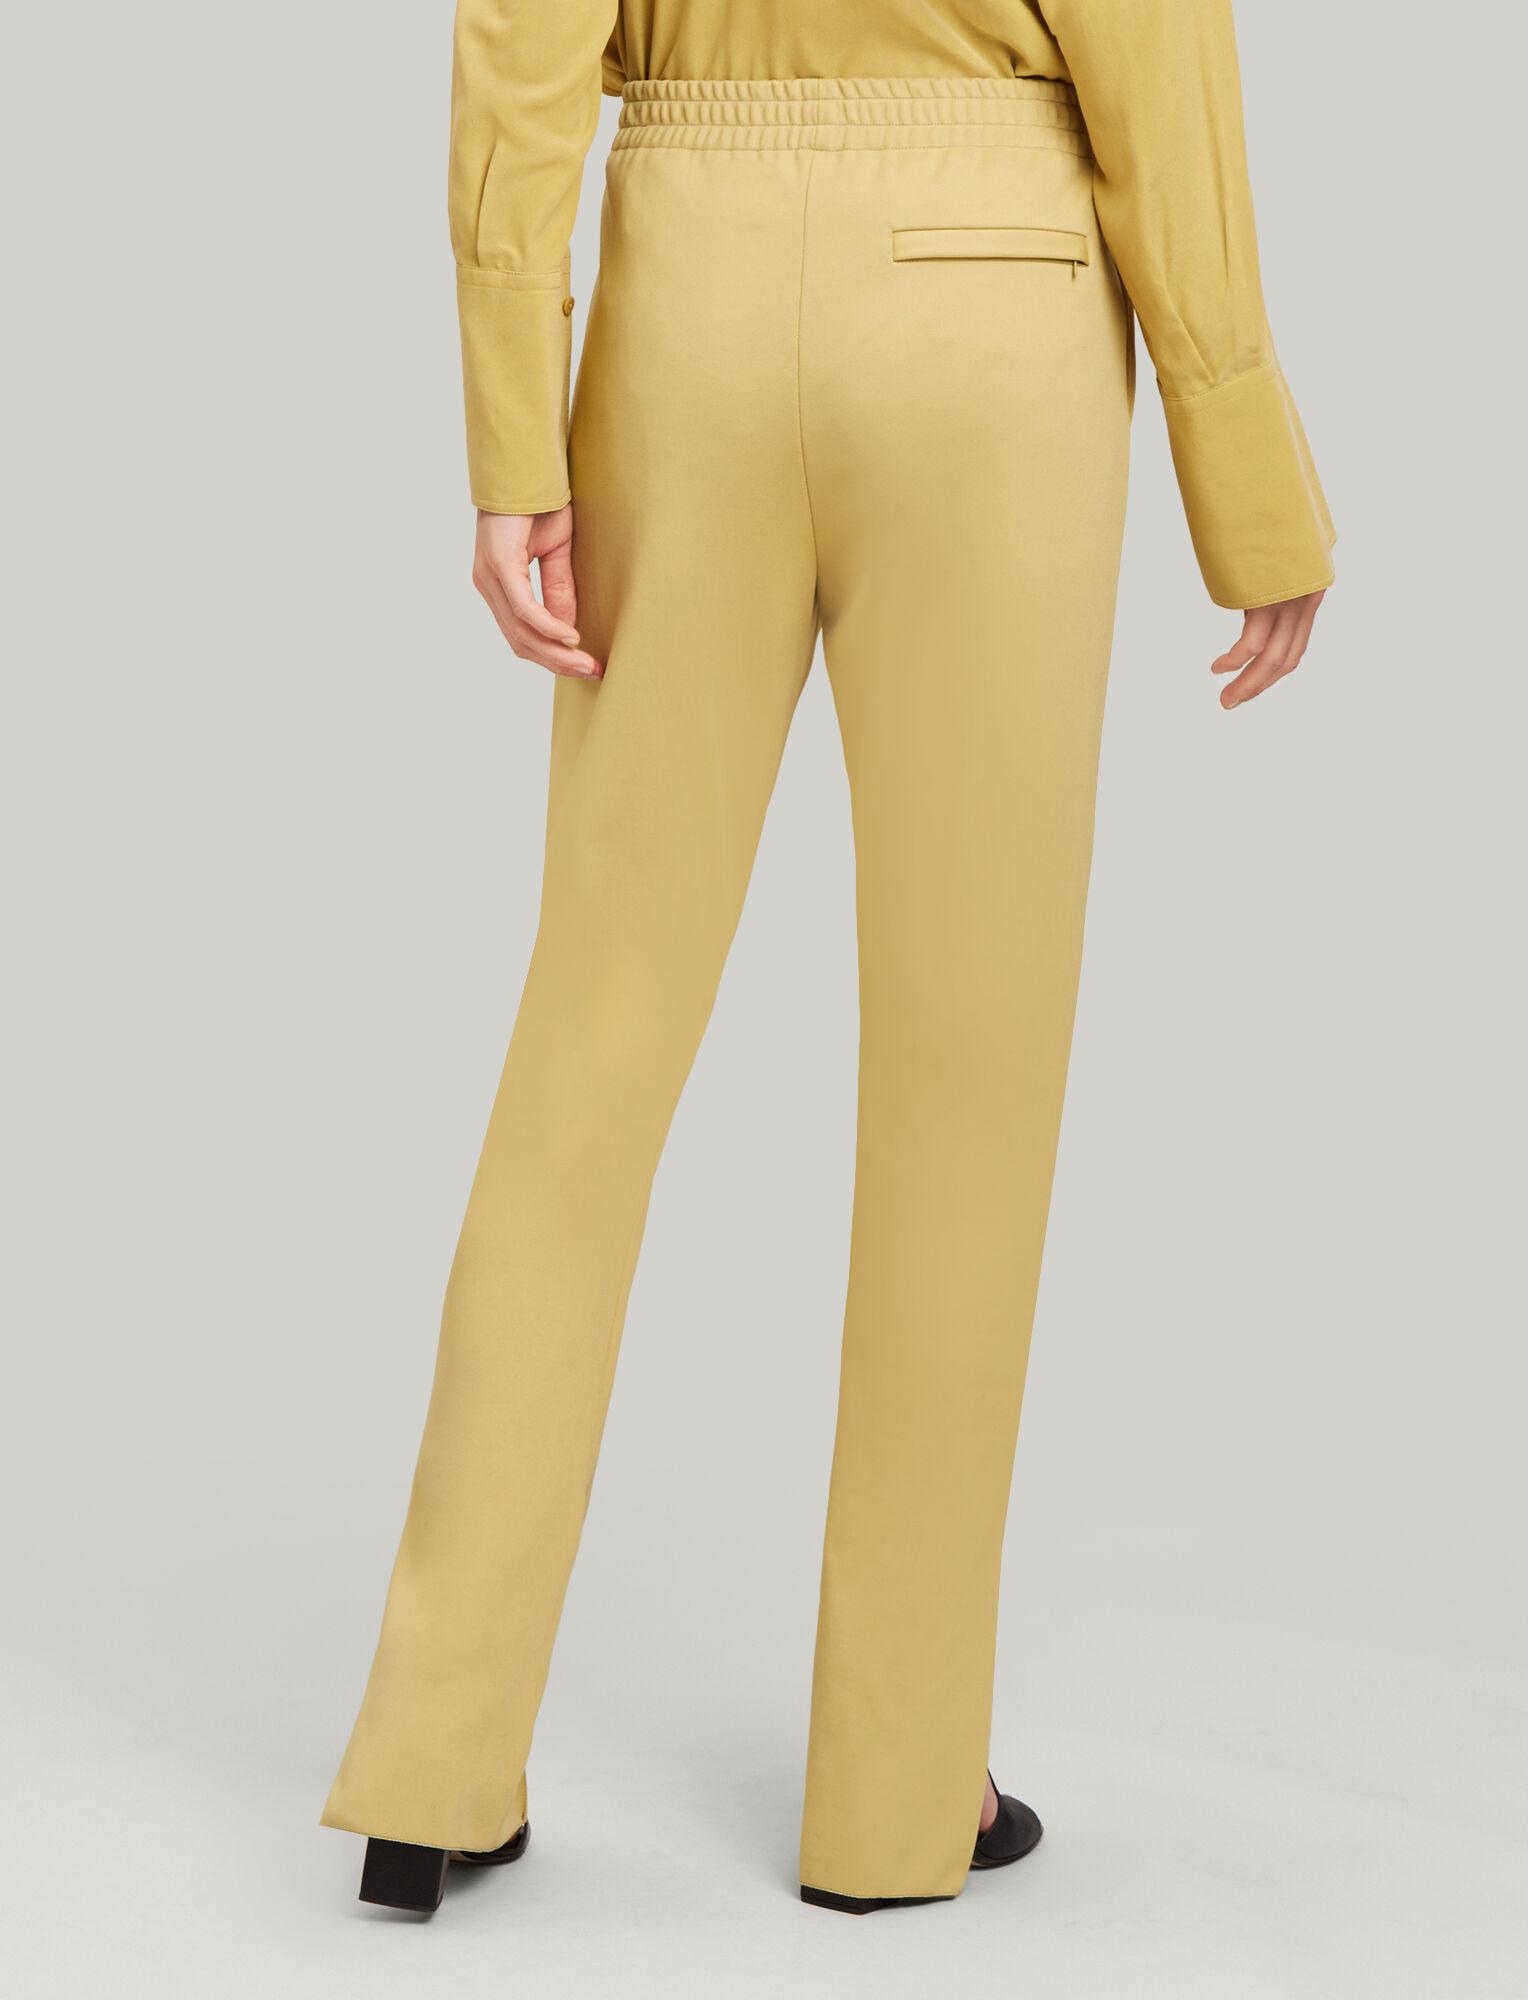 Joseph, Jog Technical Jersey Trousers, in DIJON